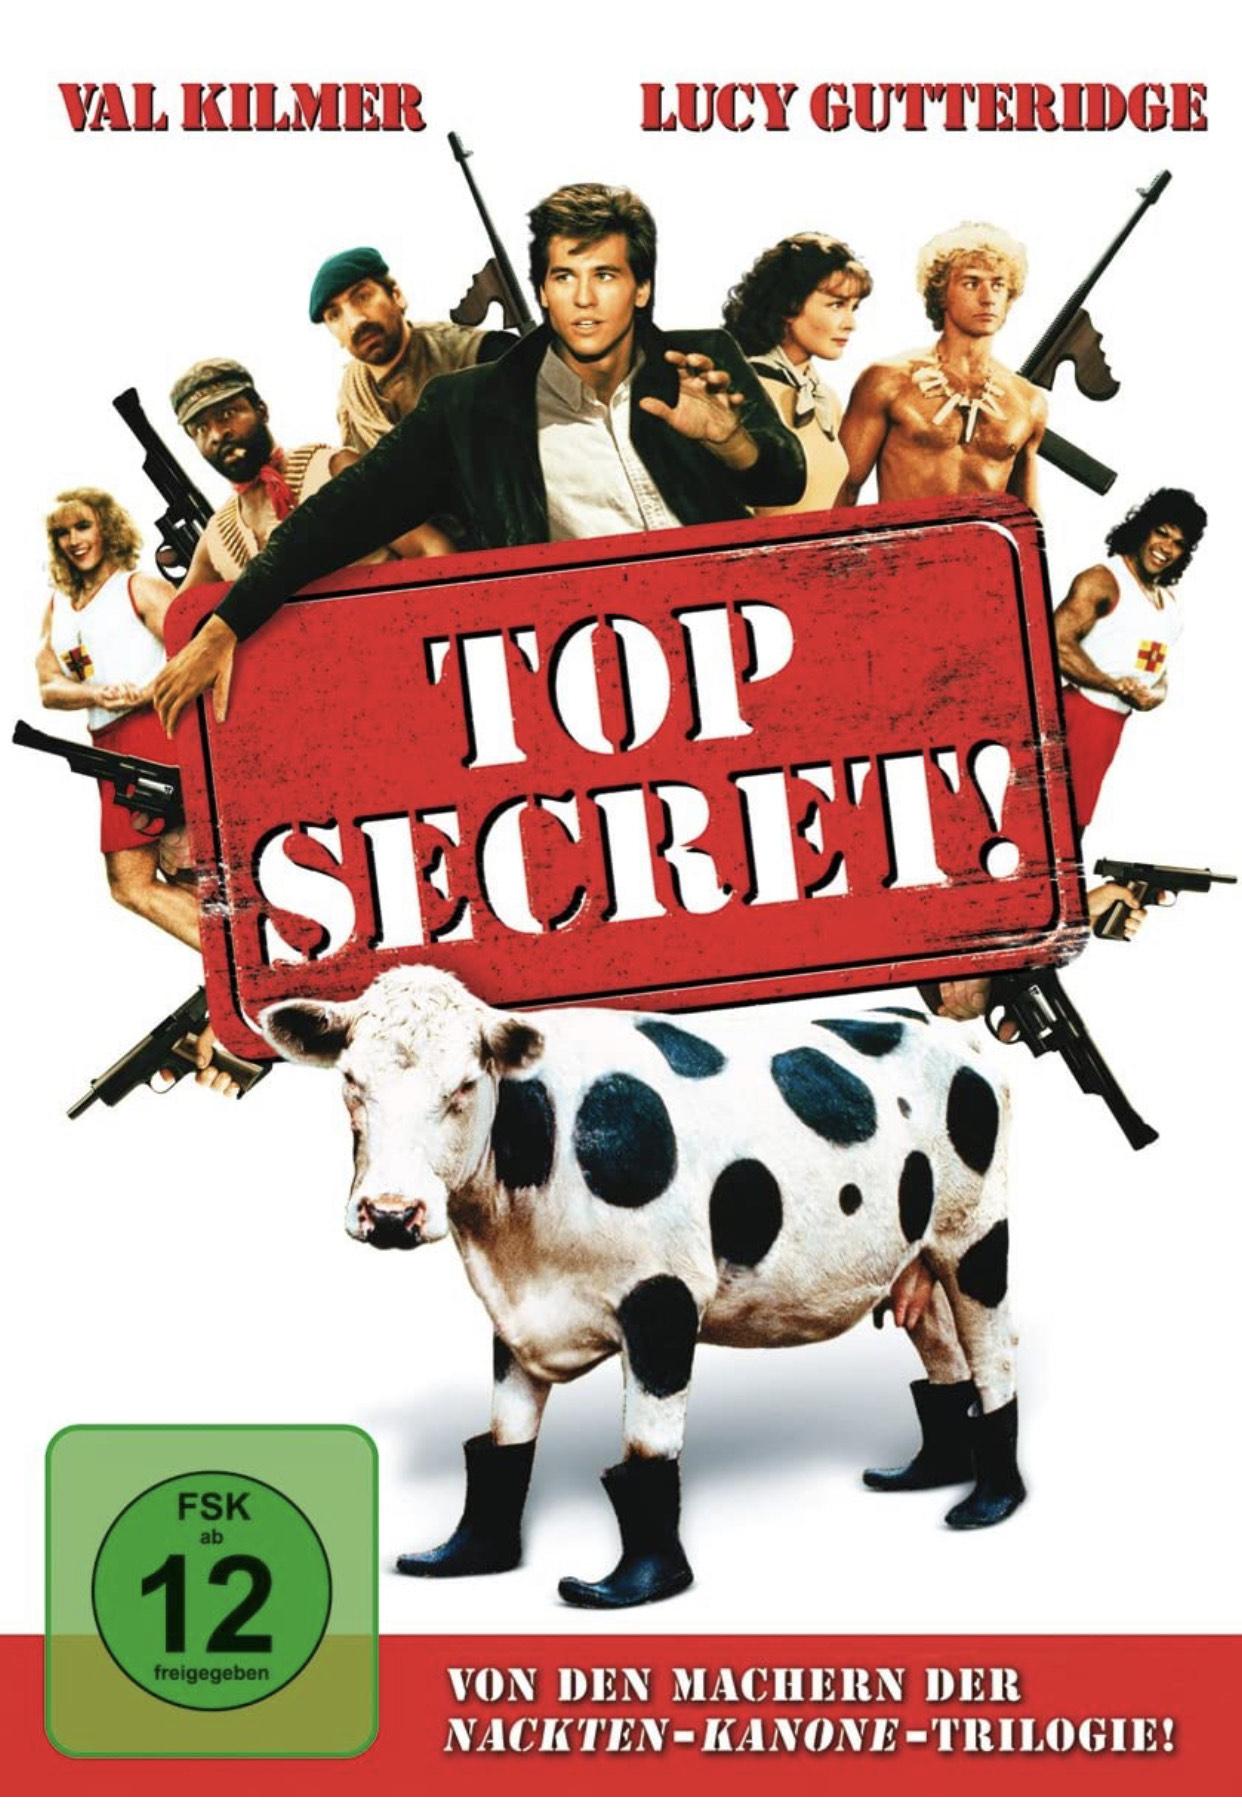 Heute schon geschmunzelt? Val Kilmer in TOP SECRET! - DVD | Amazon Prime